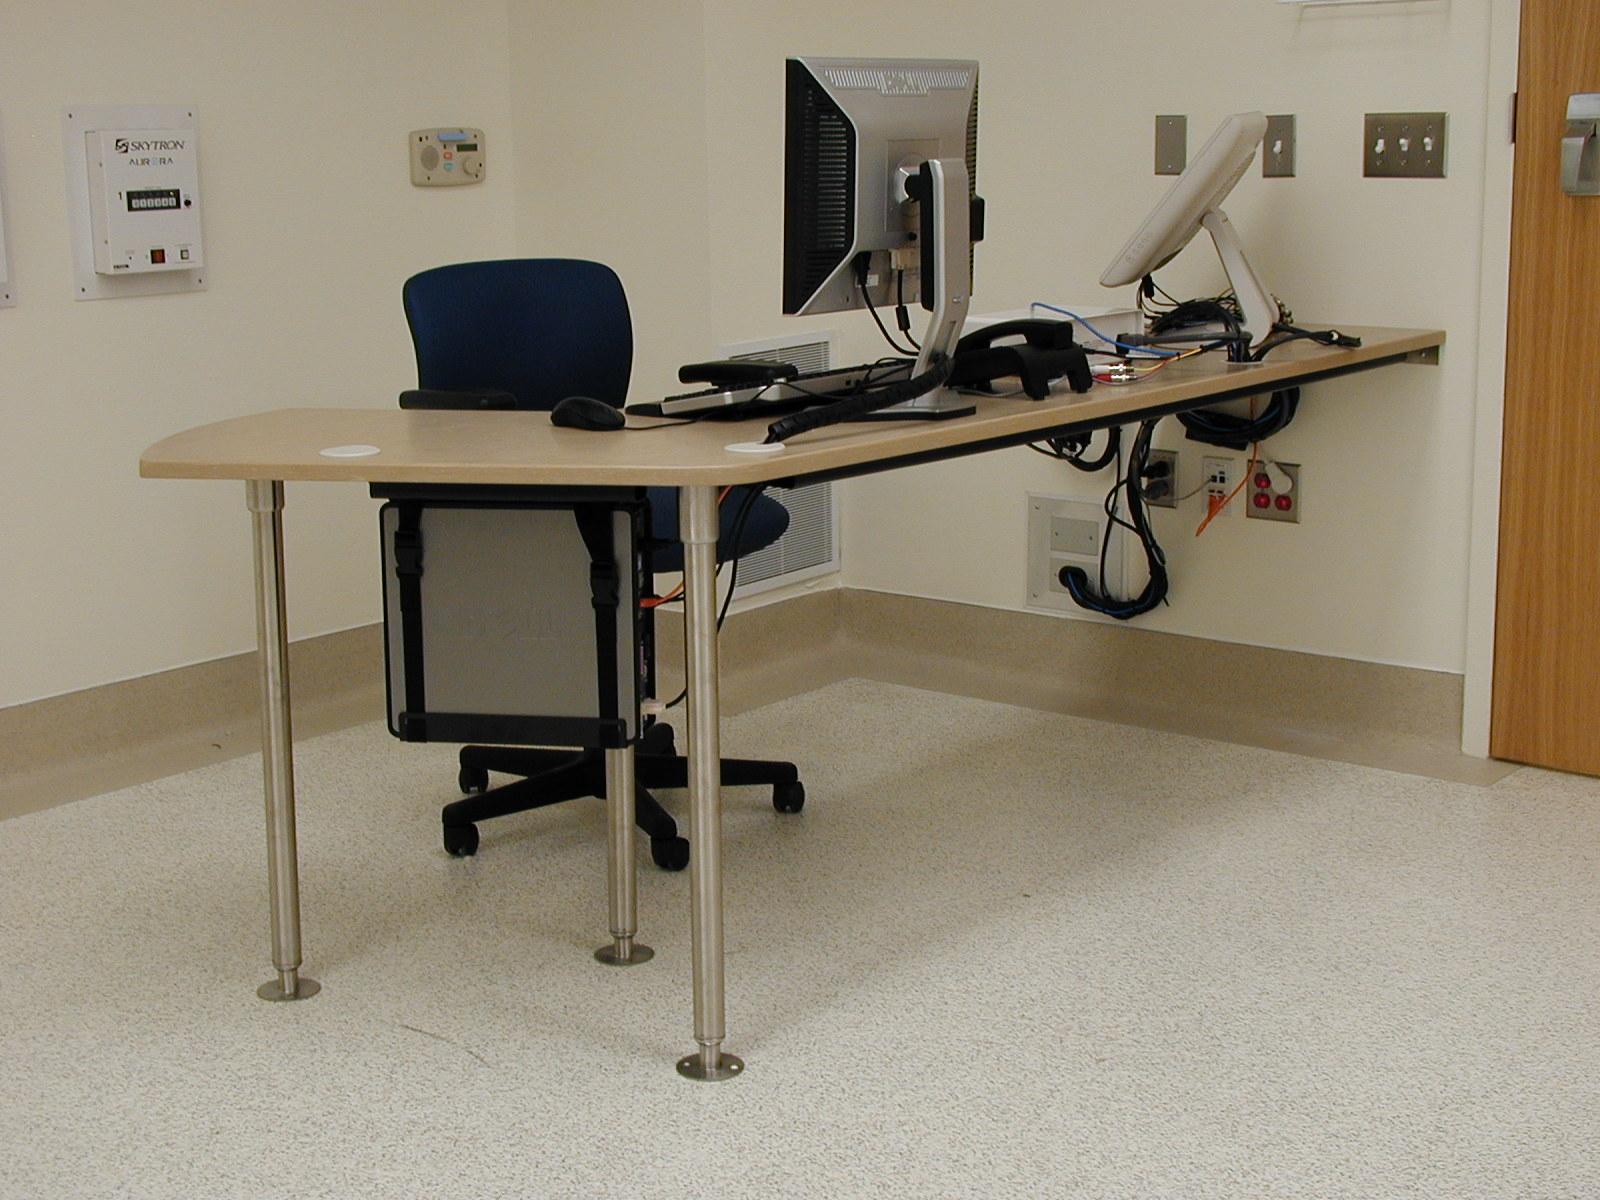 Stonybrook Desk3.jpg